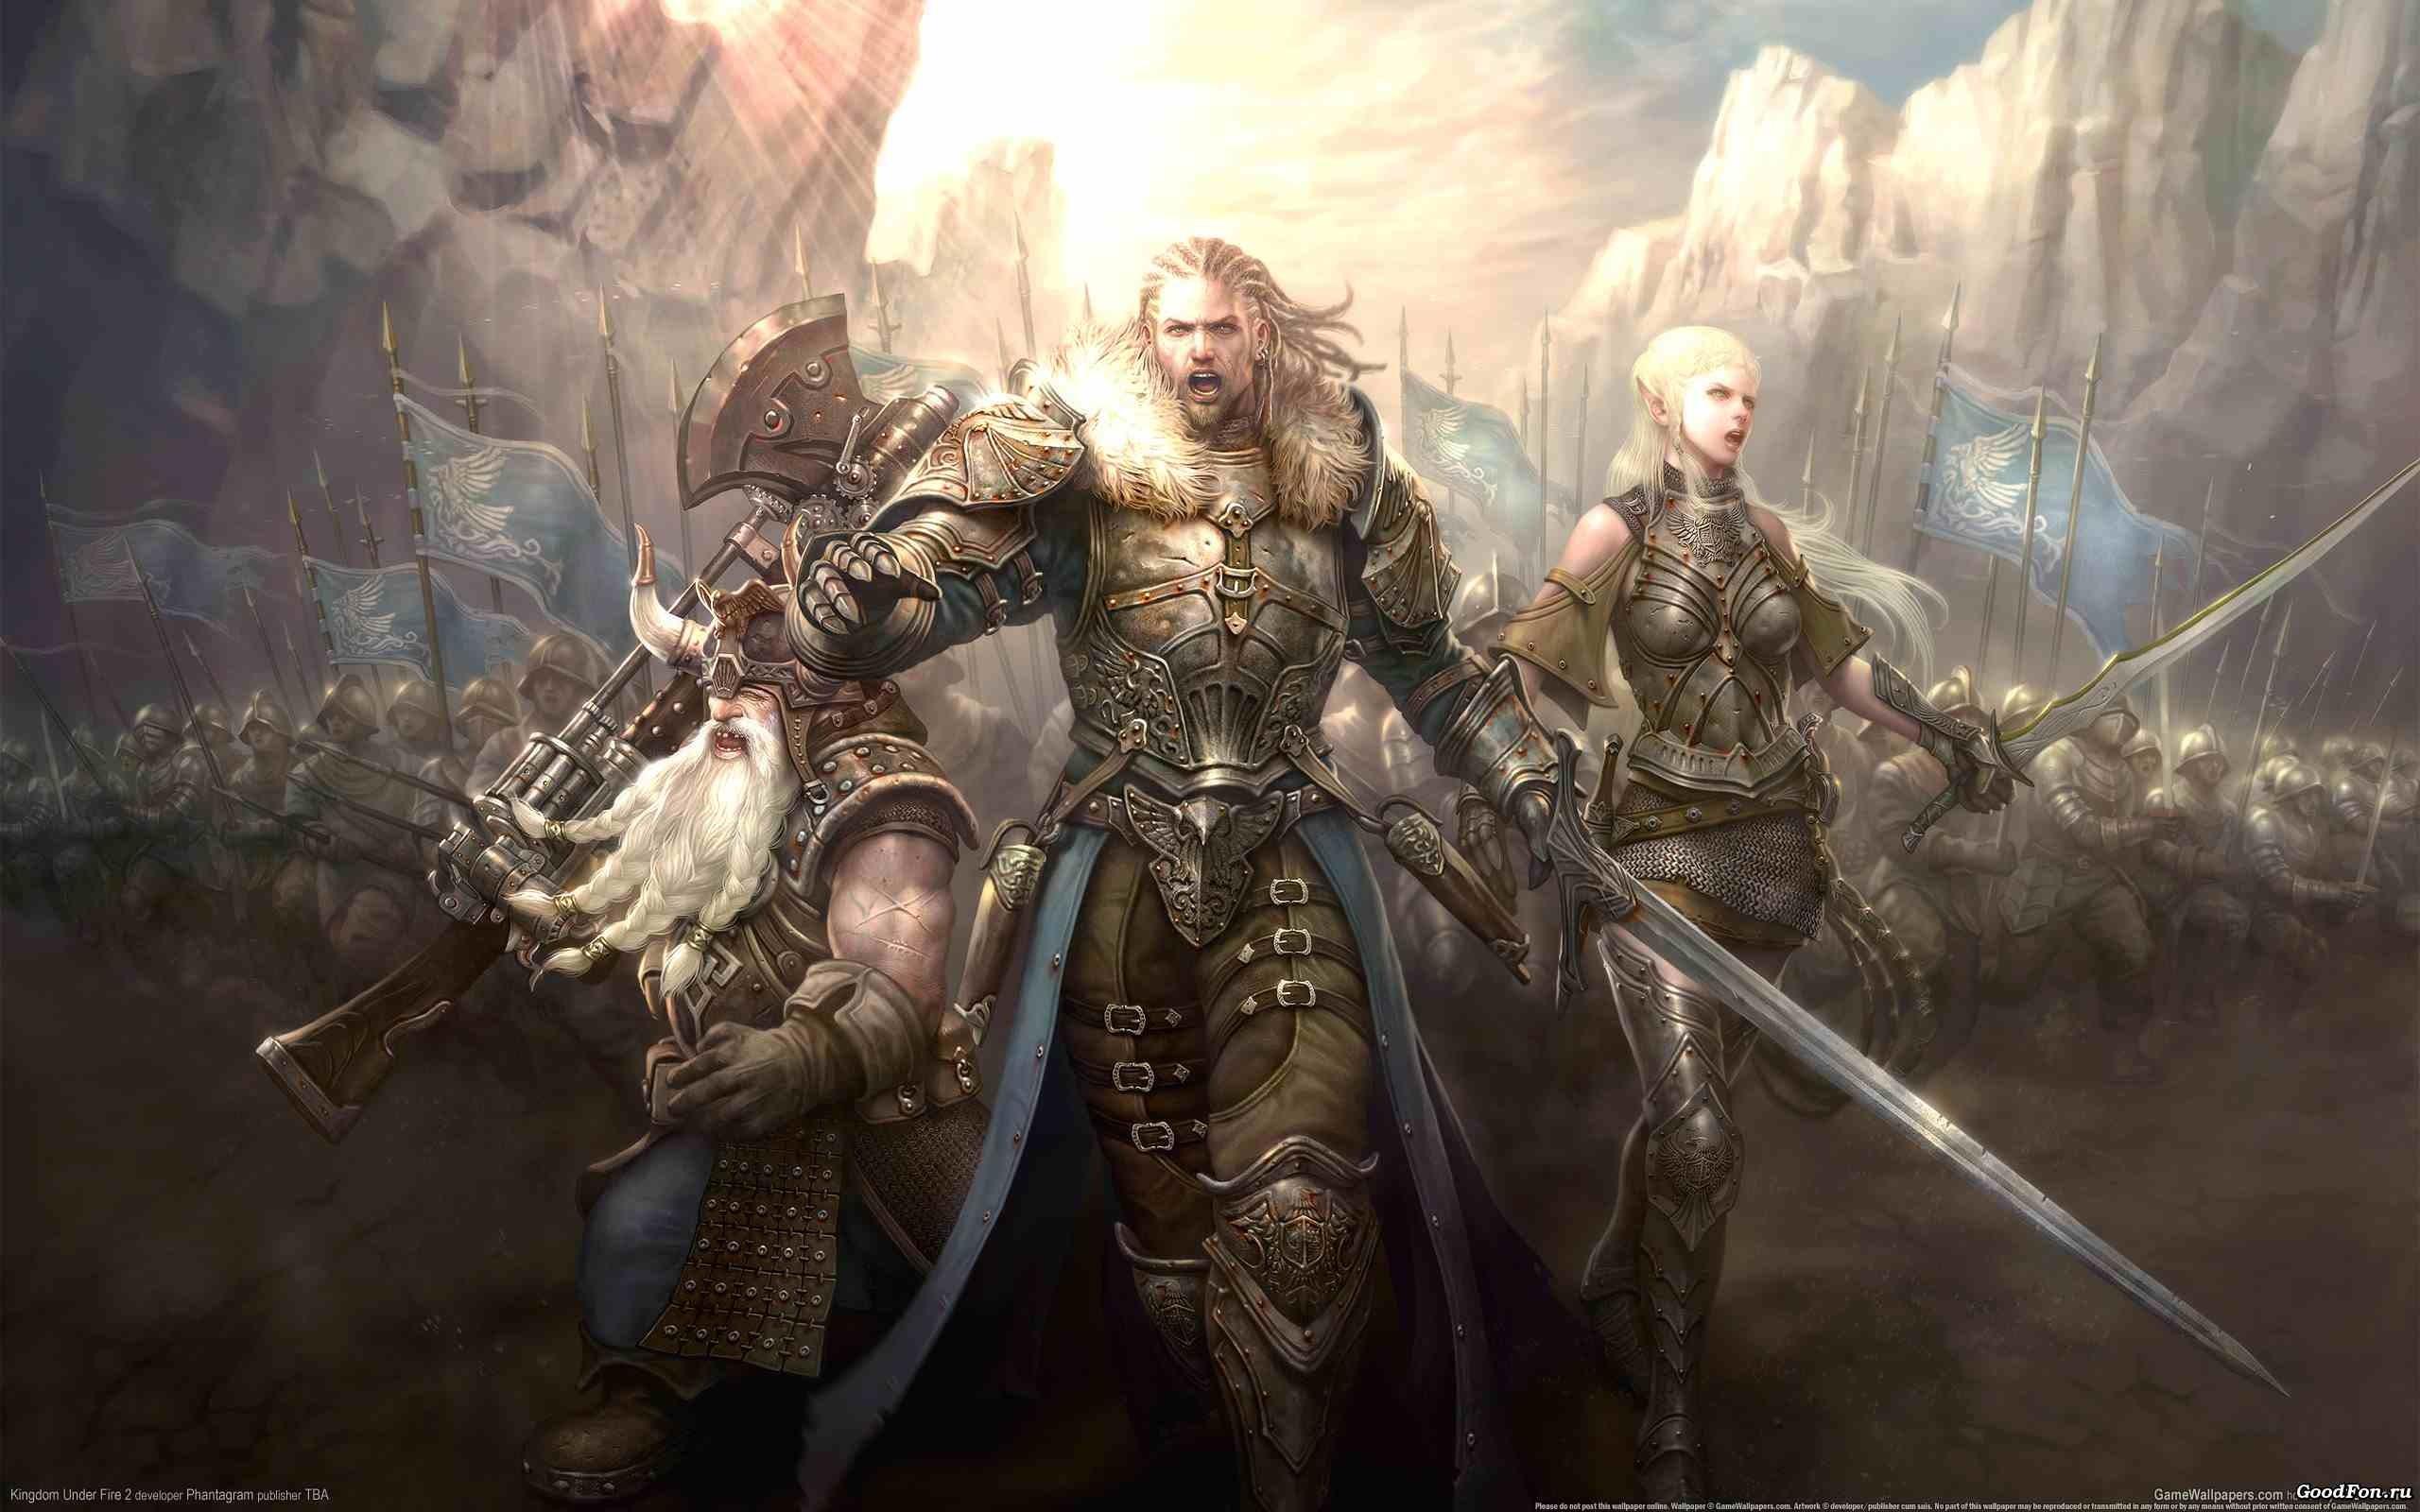 video game kingdom under fire Wallpaper Backgrounds